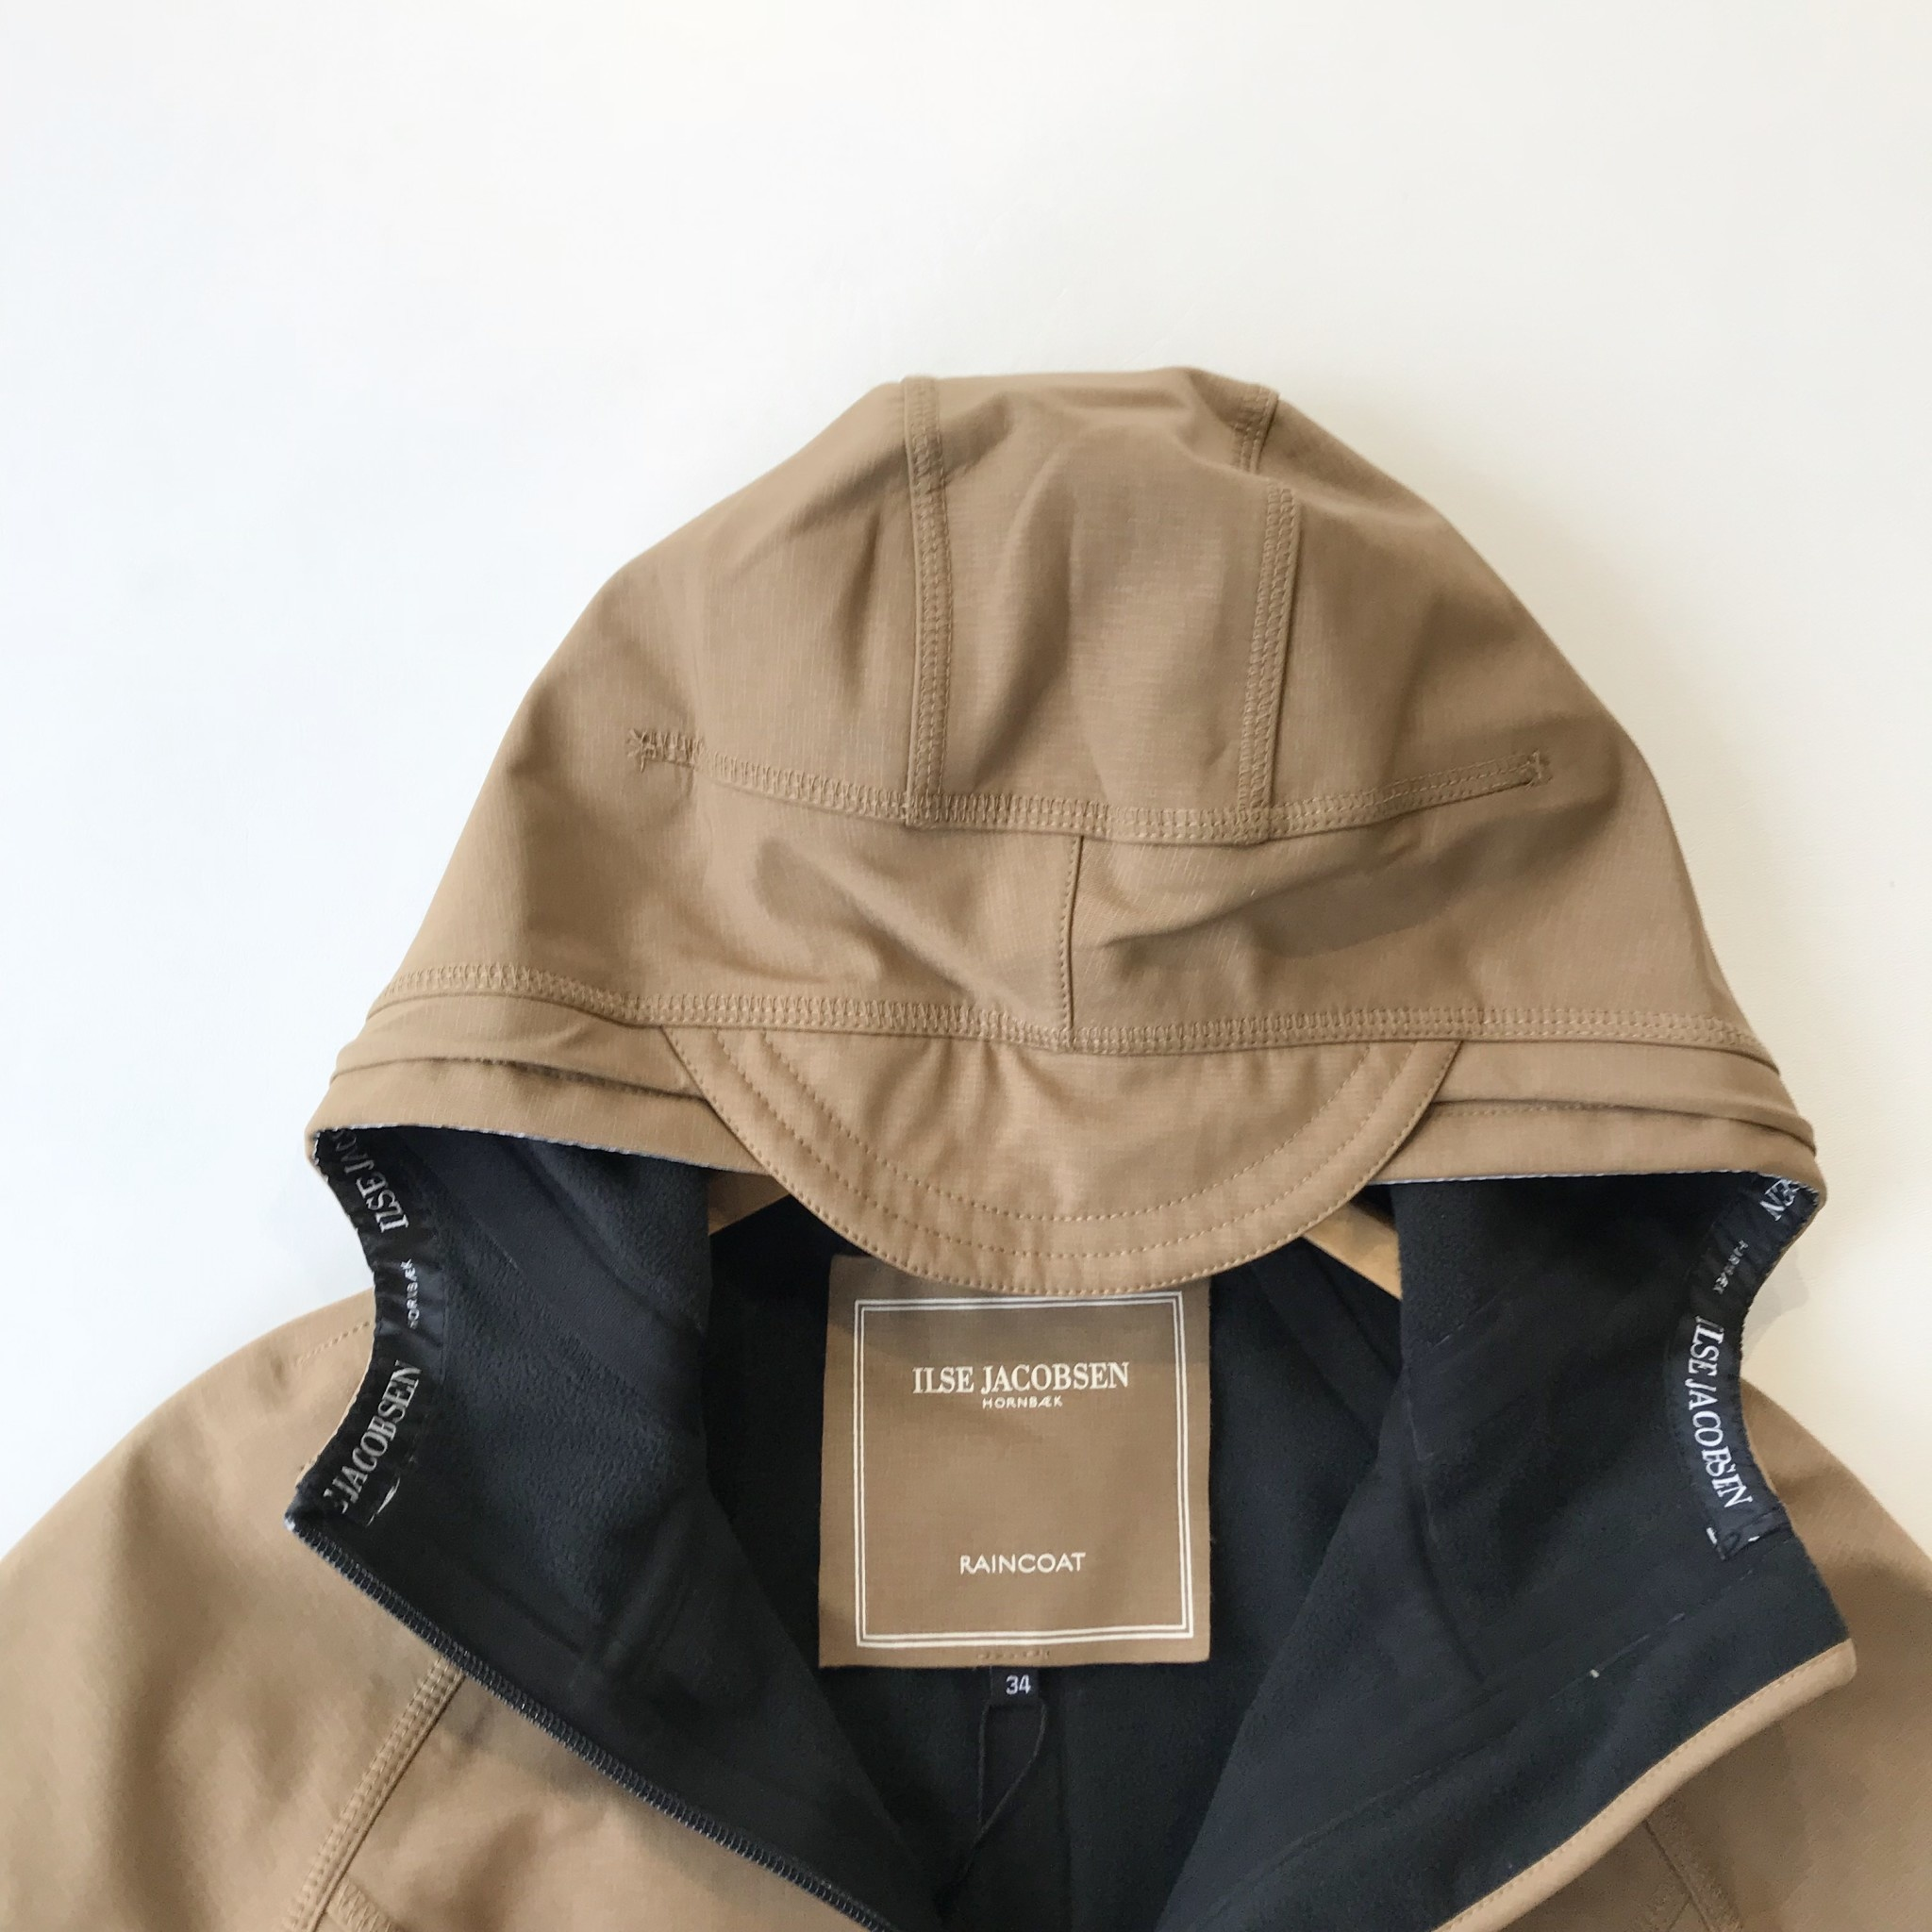 Ilse Jacobsen rain 37 coat